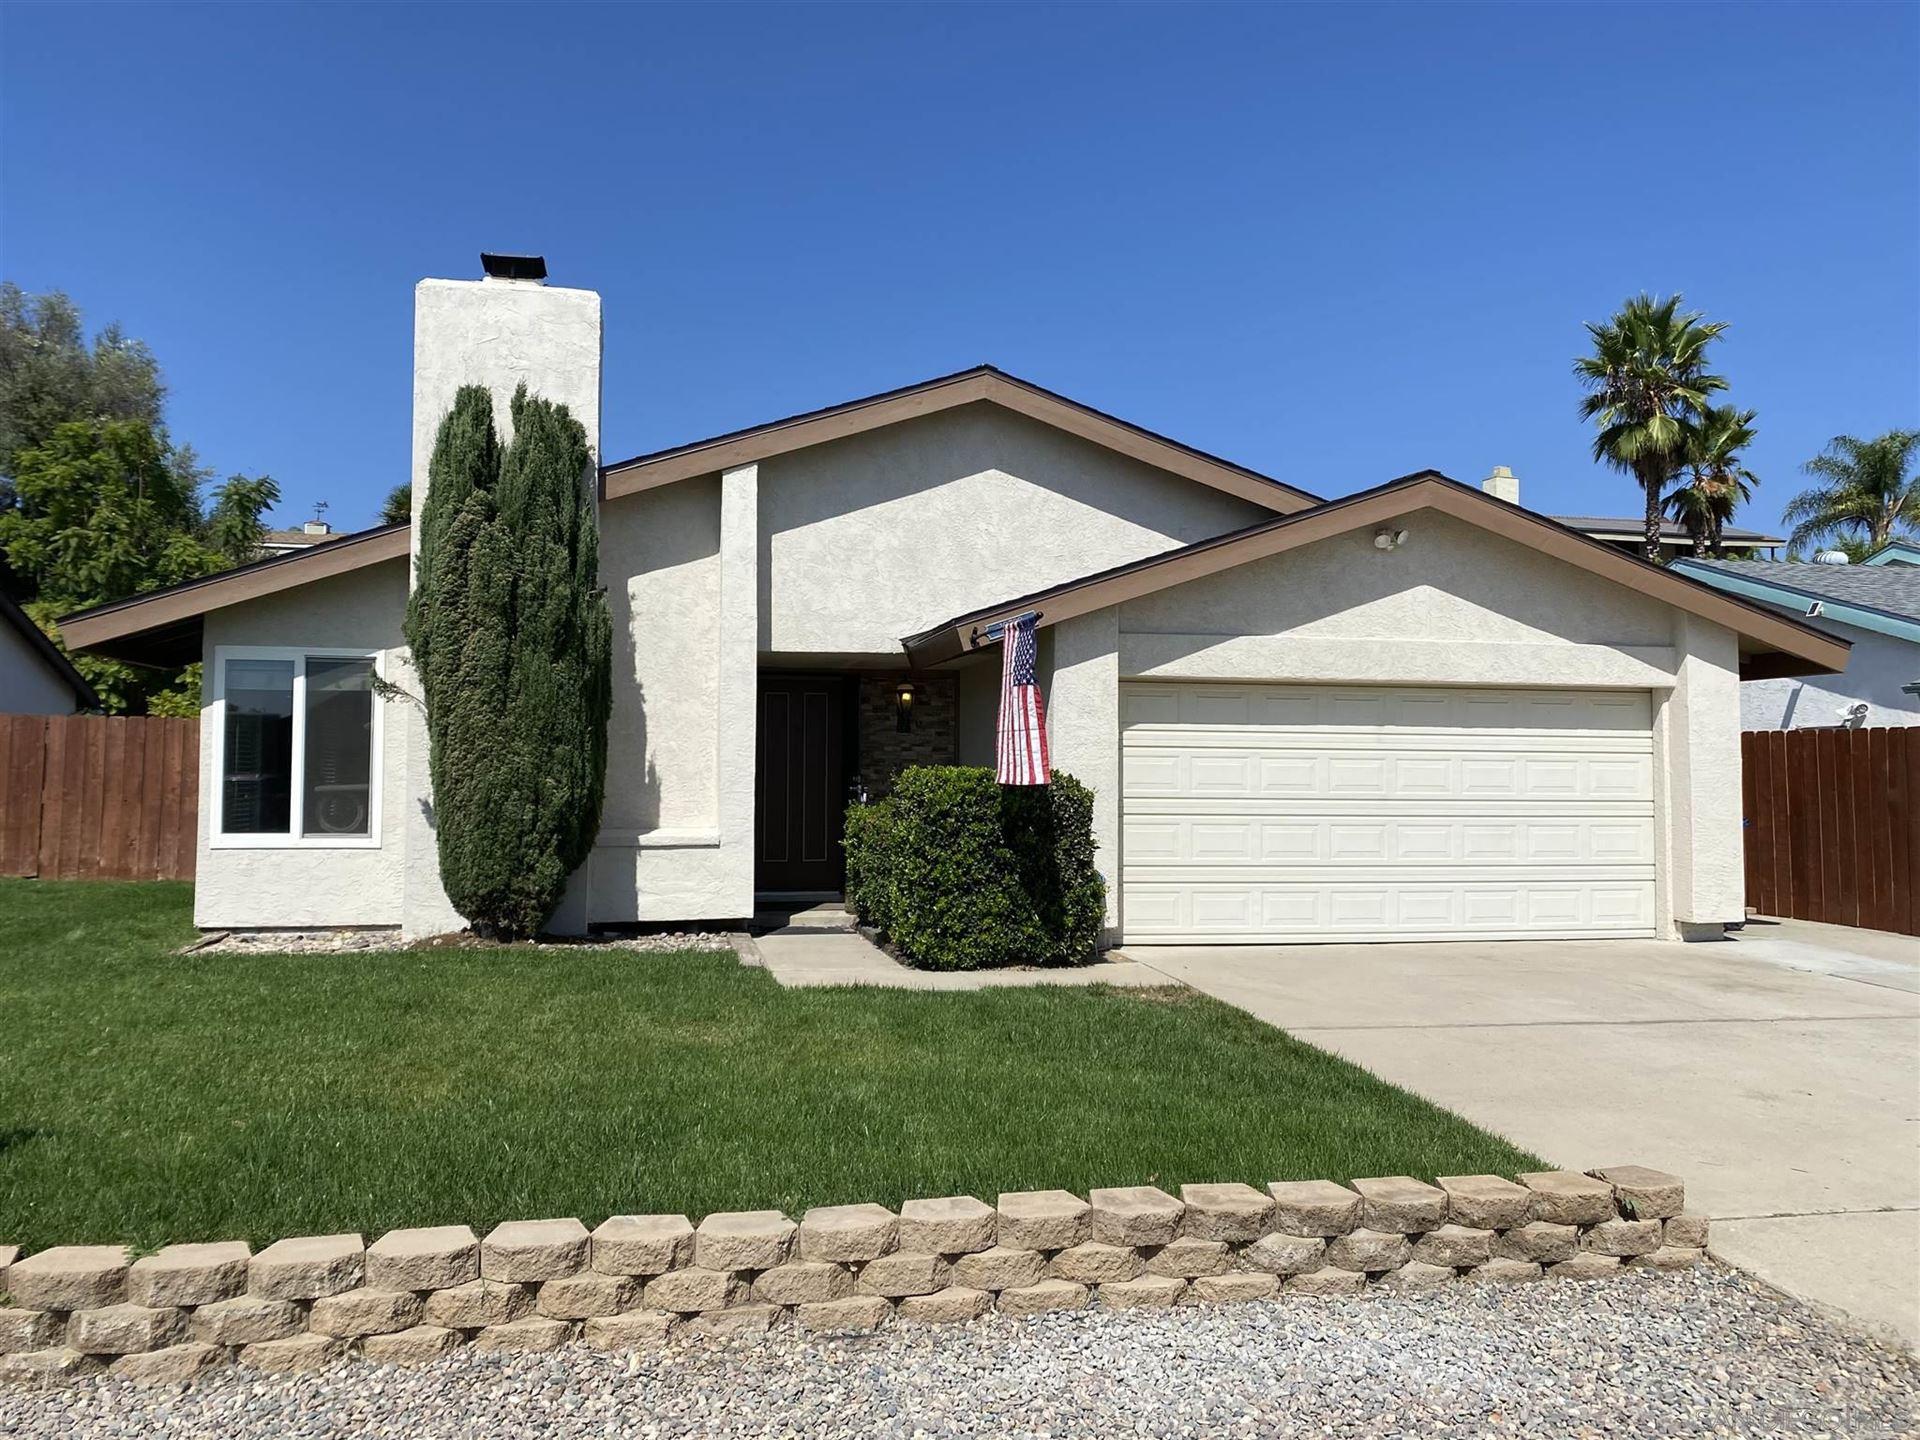 10732 2nd St., Santee, CA 92071 - MLS#: 200046136